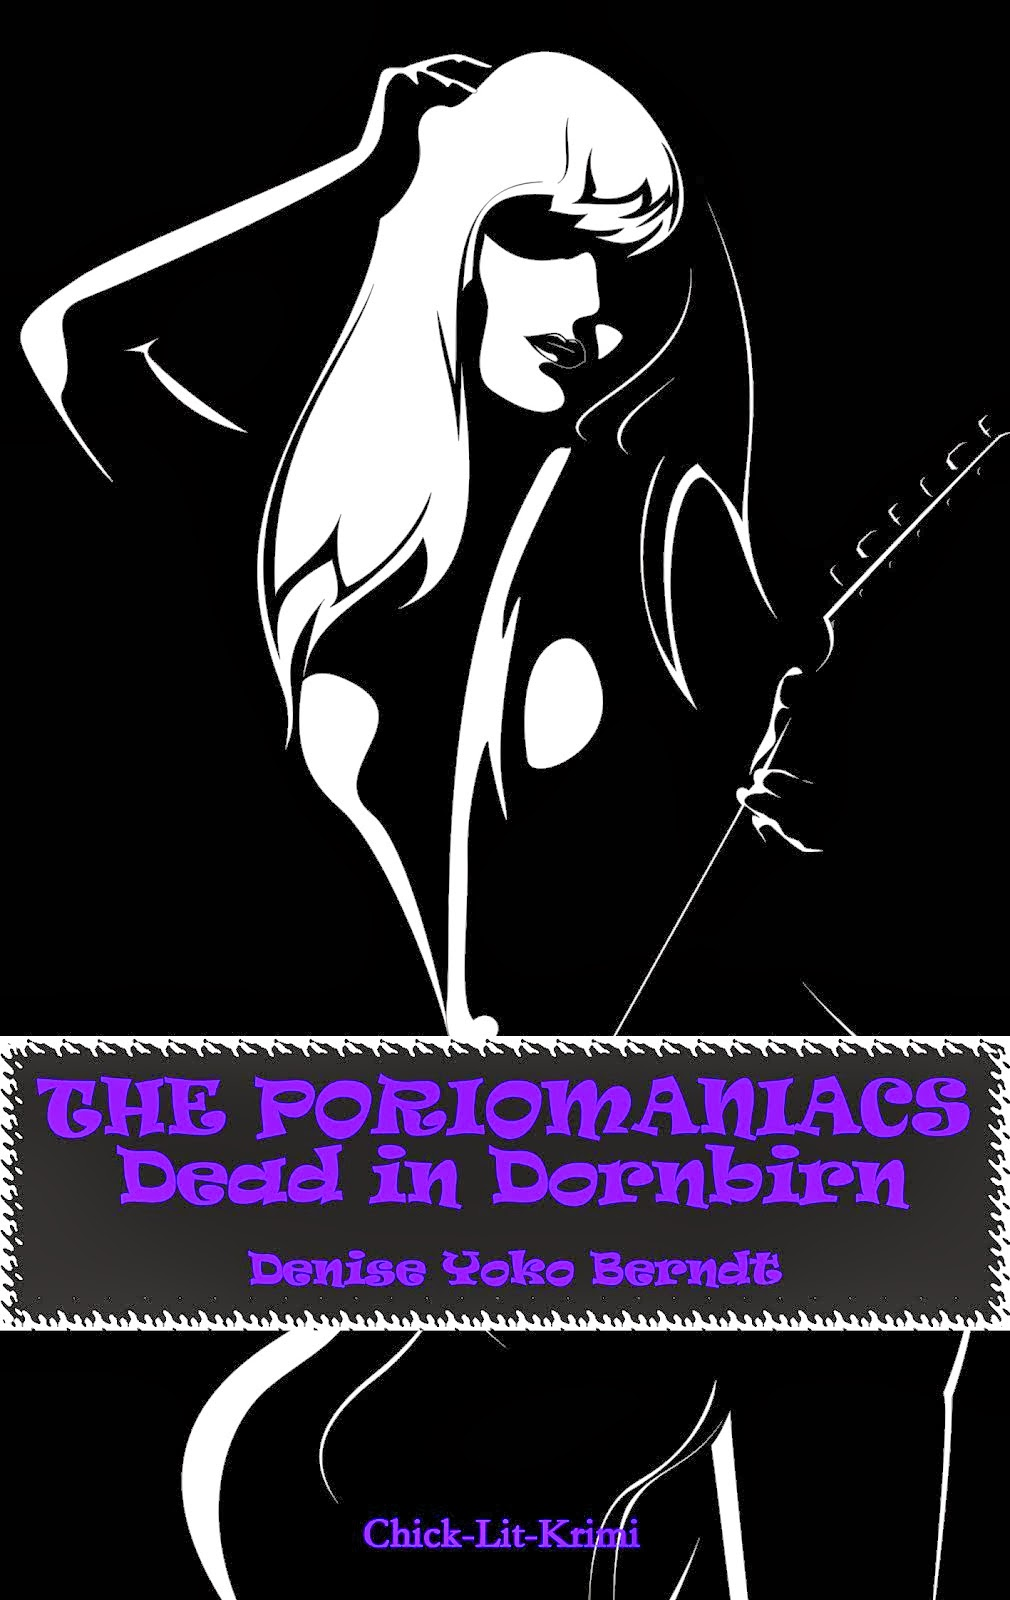 Dead in Dornbirn